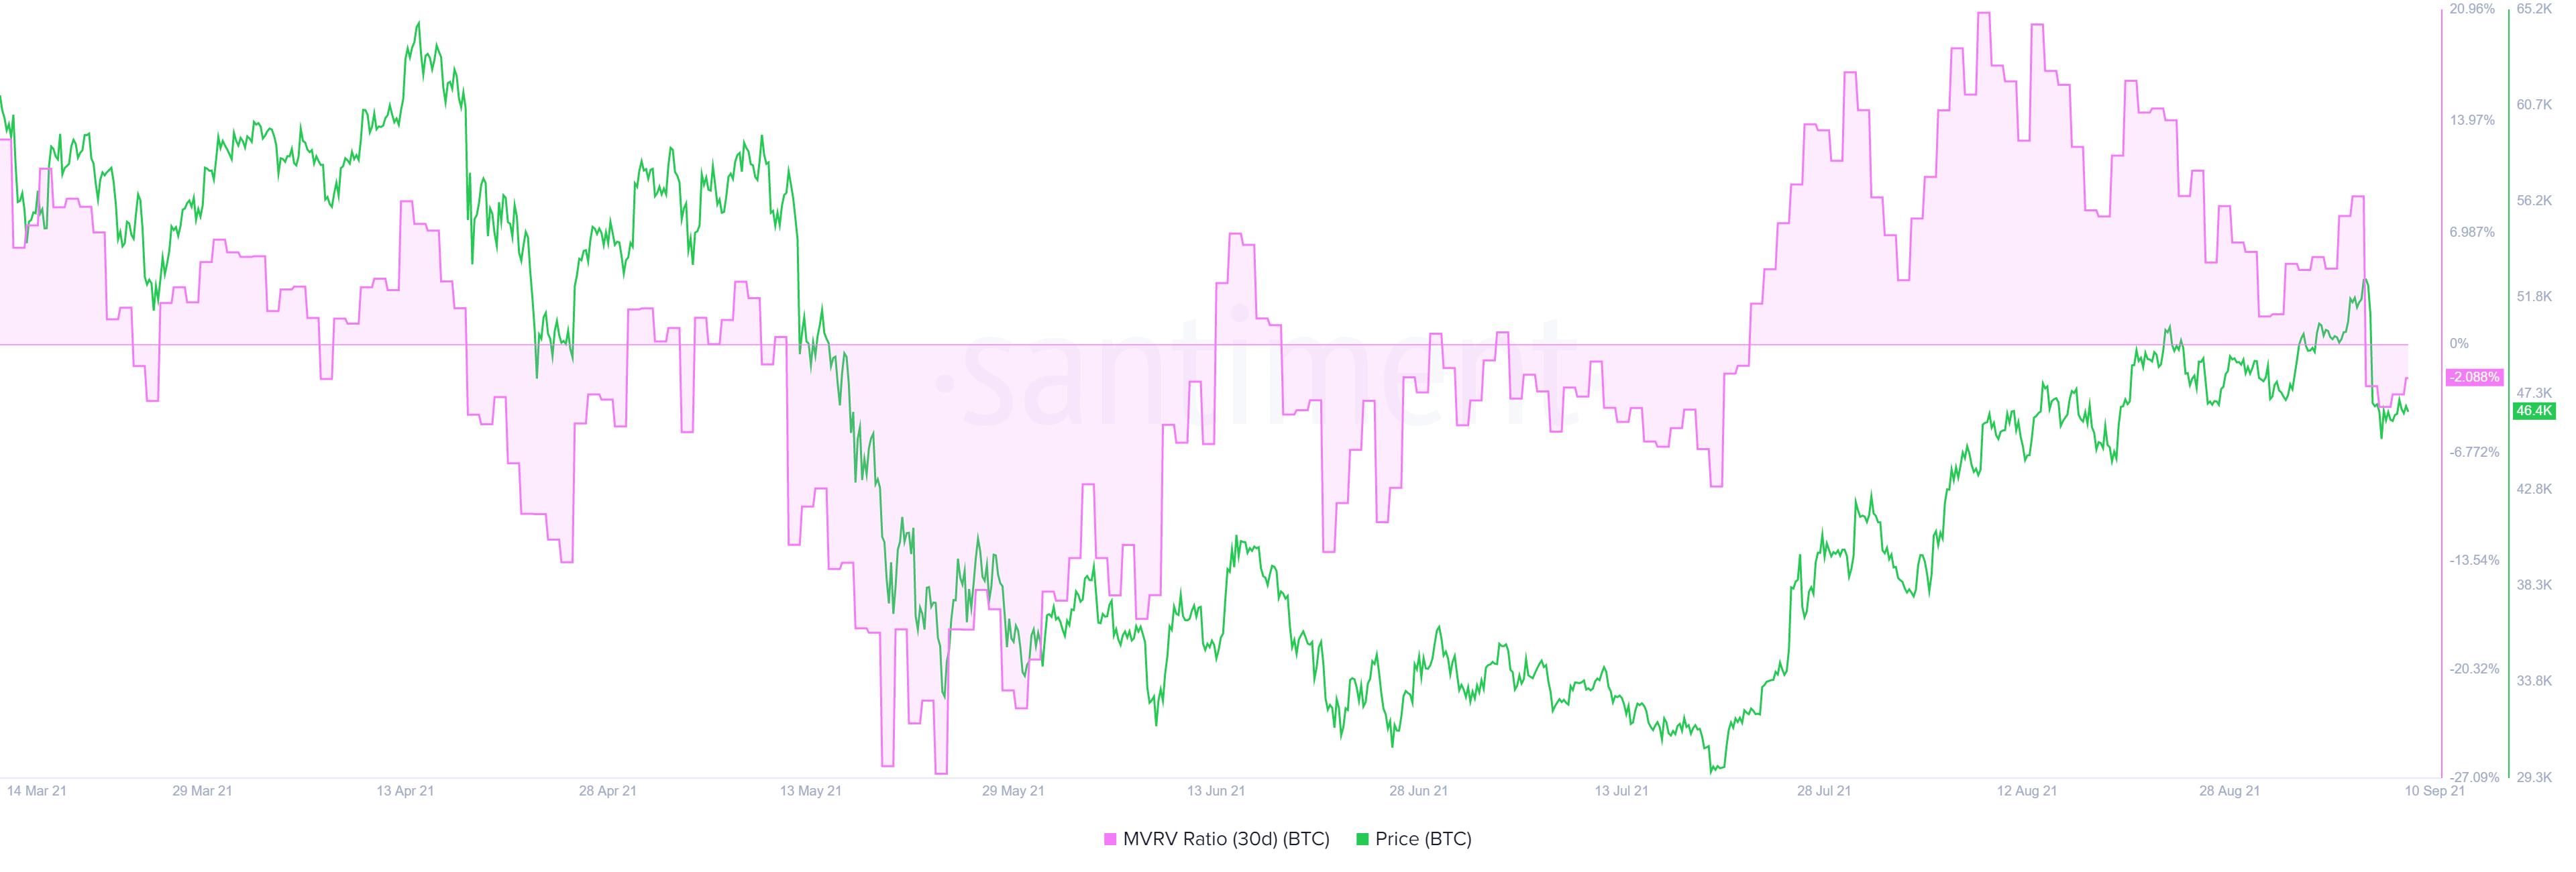 BTC MVRV 30-day chart